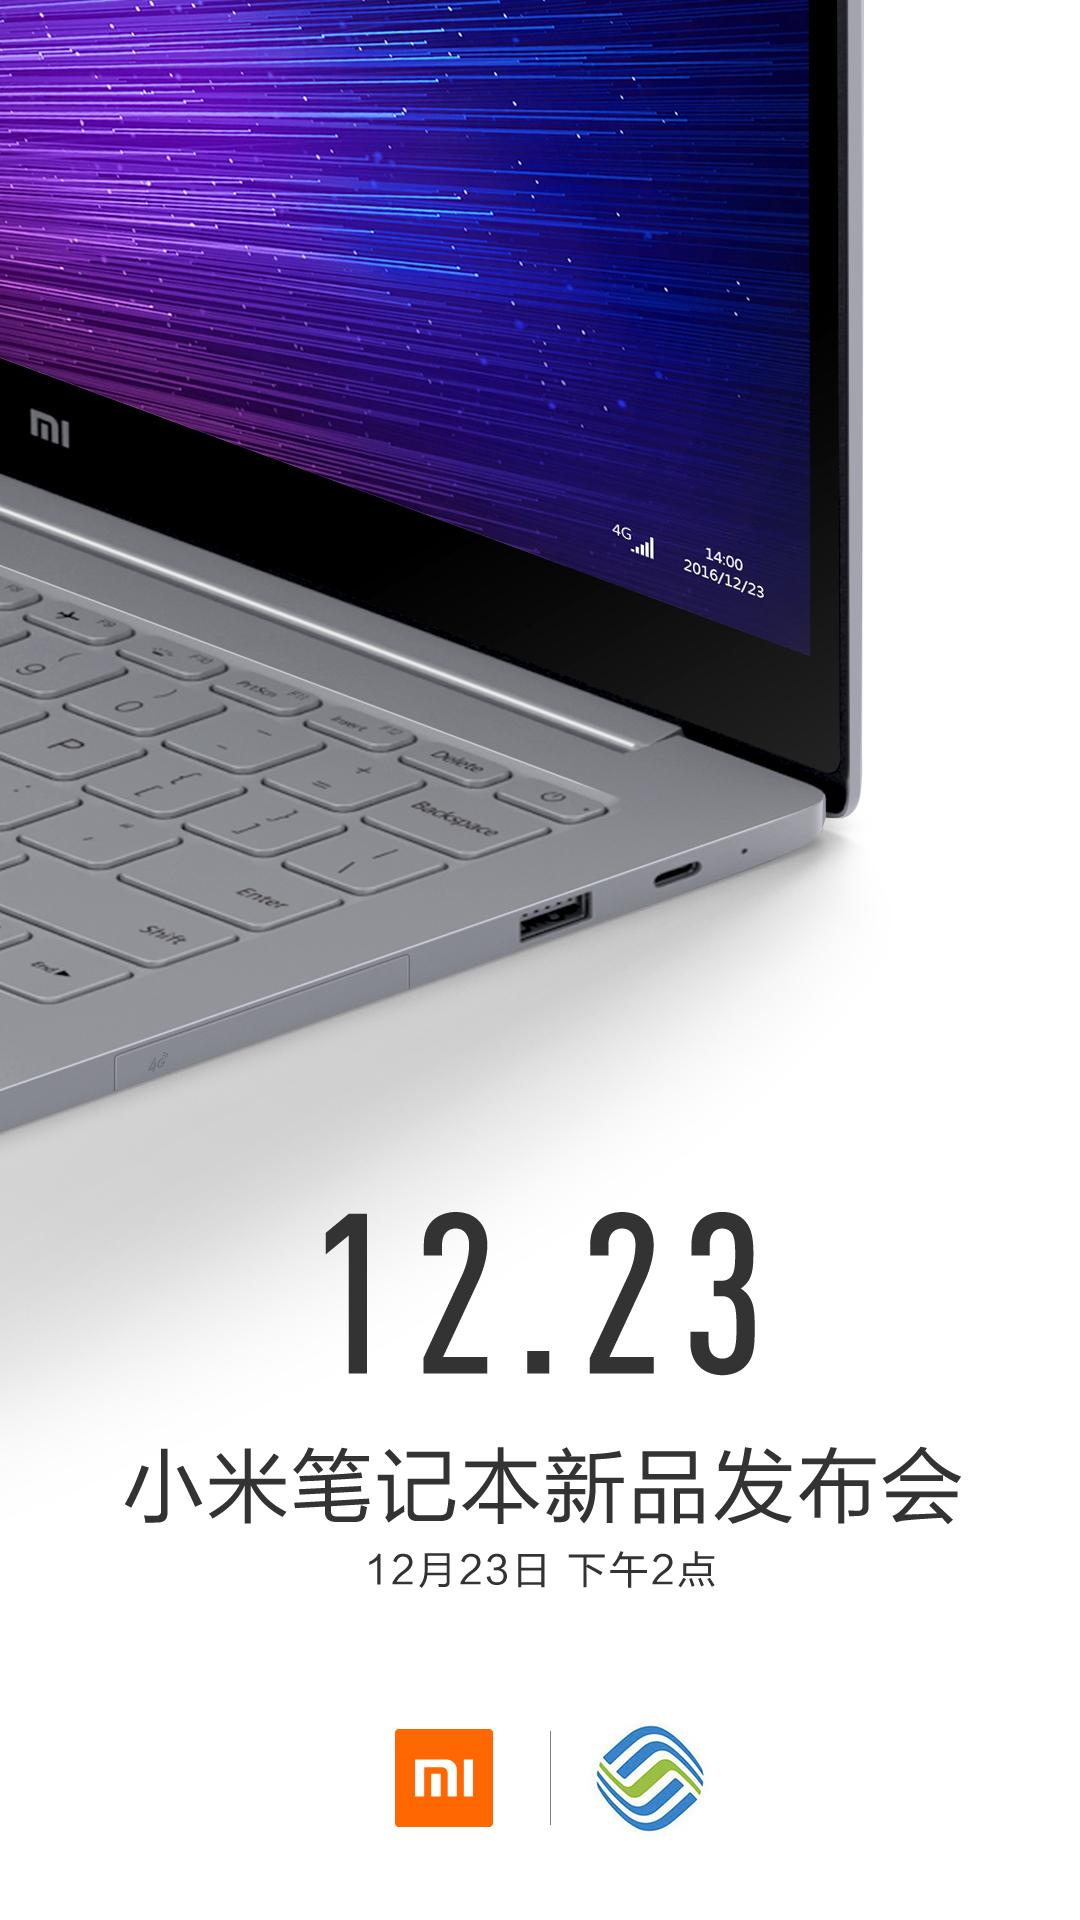 mi-notebook-air-2